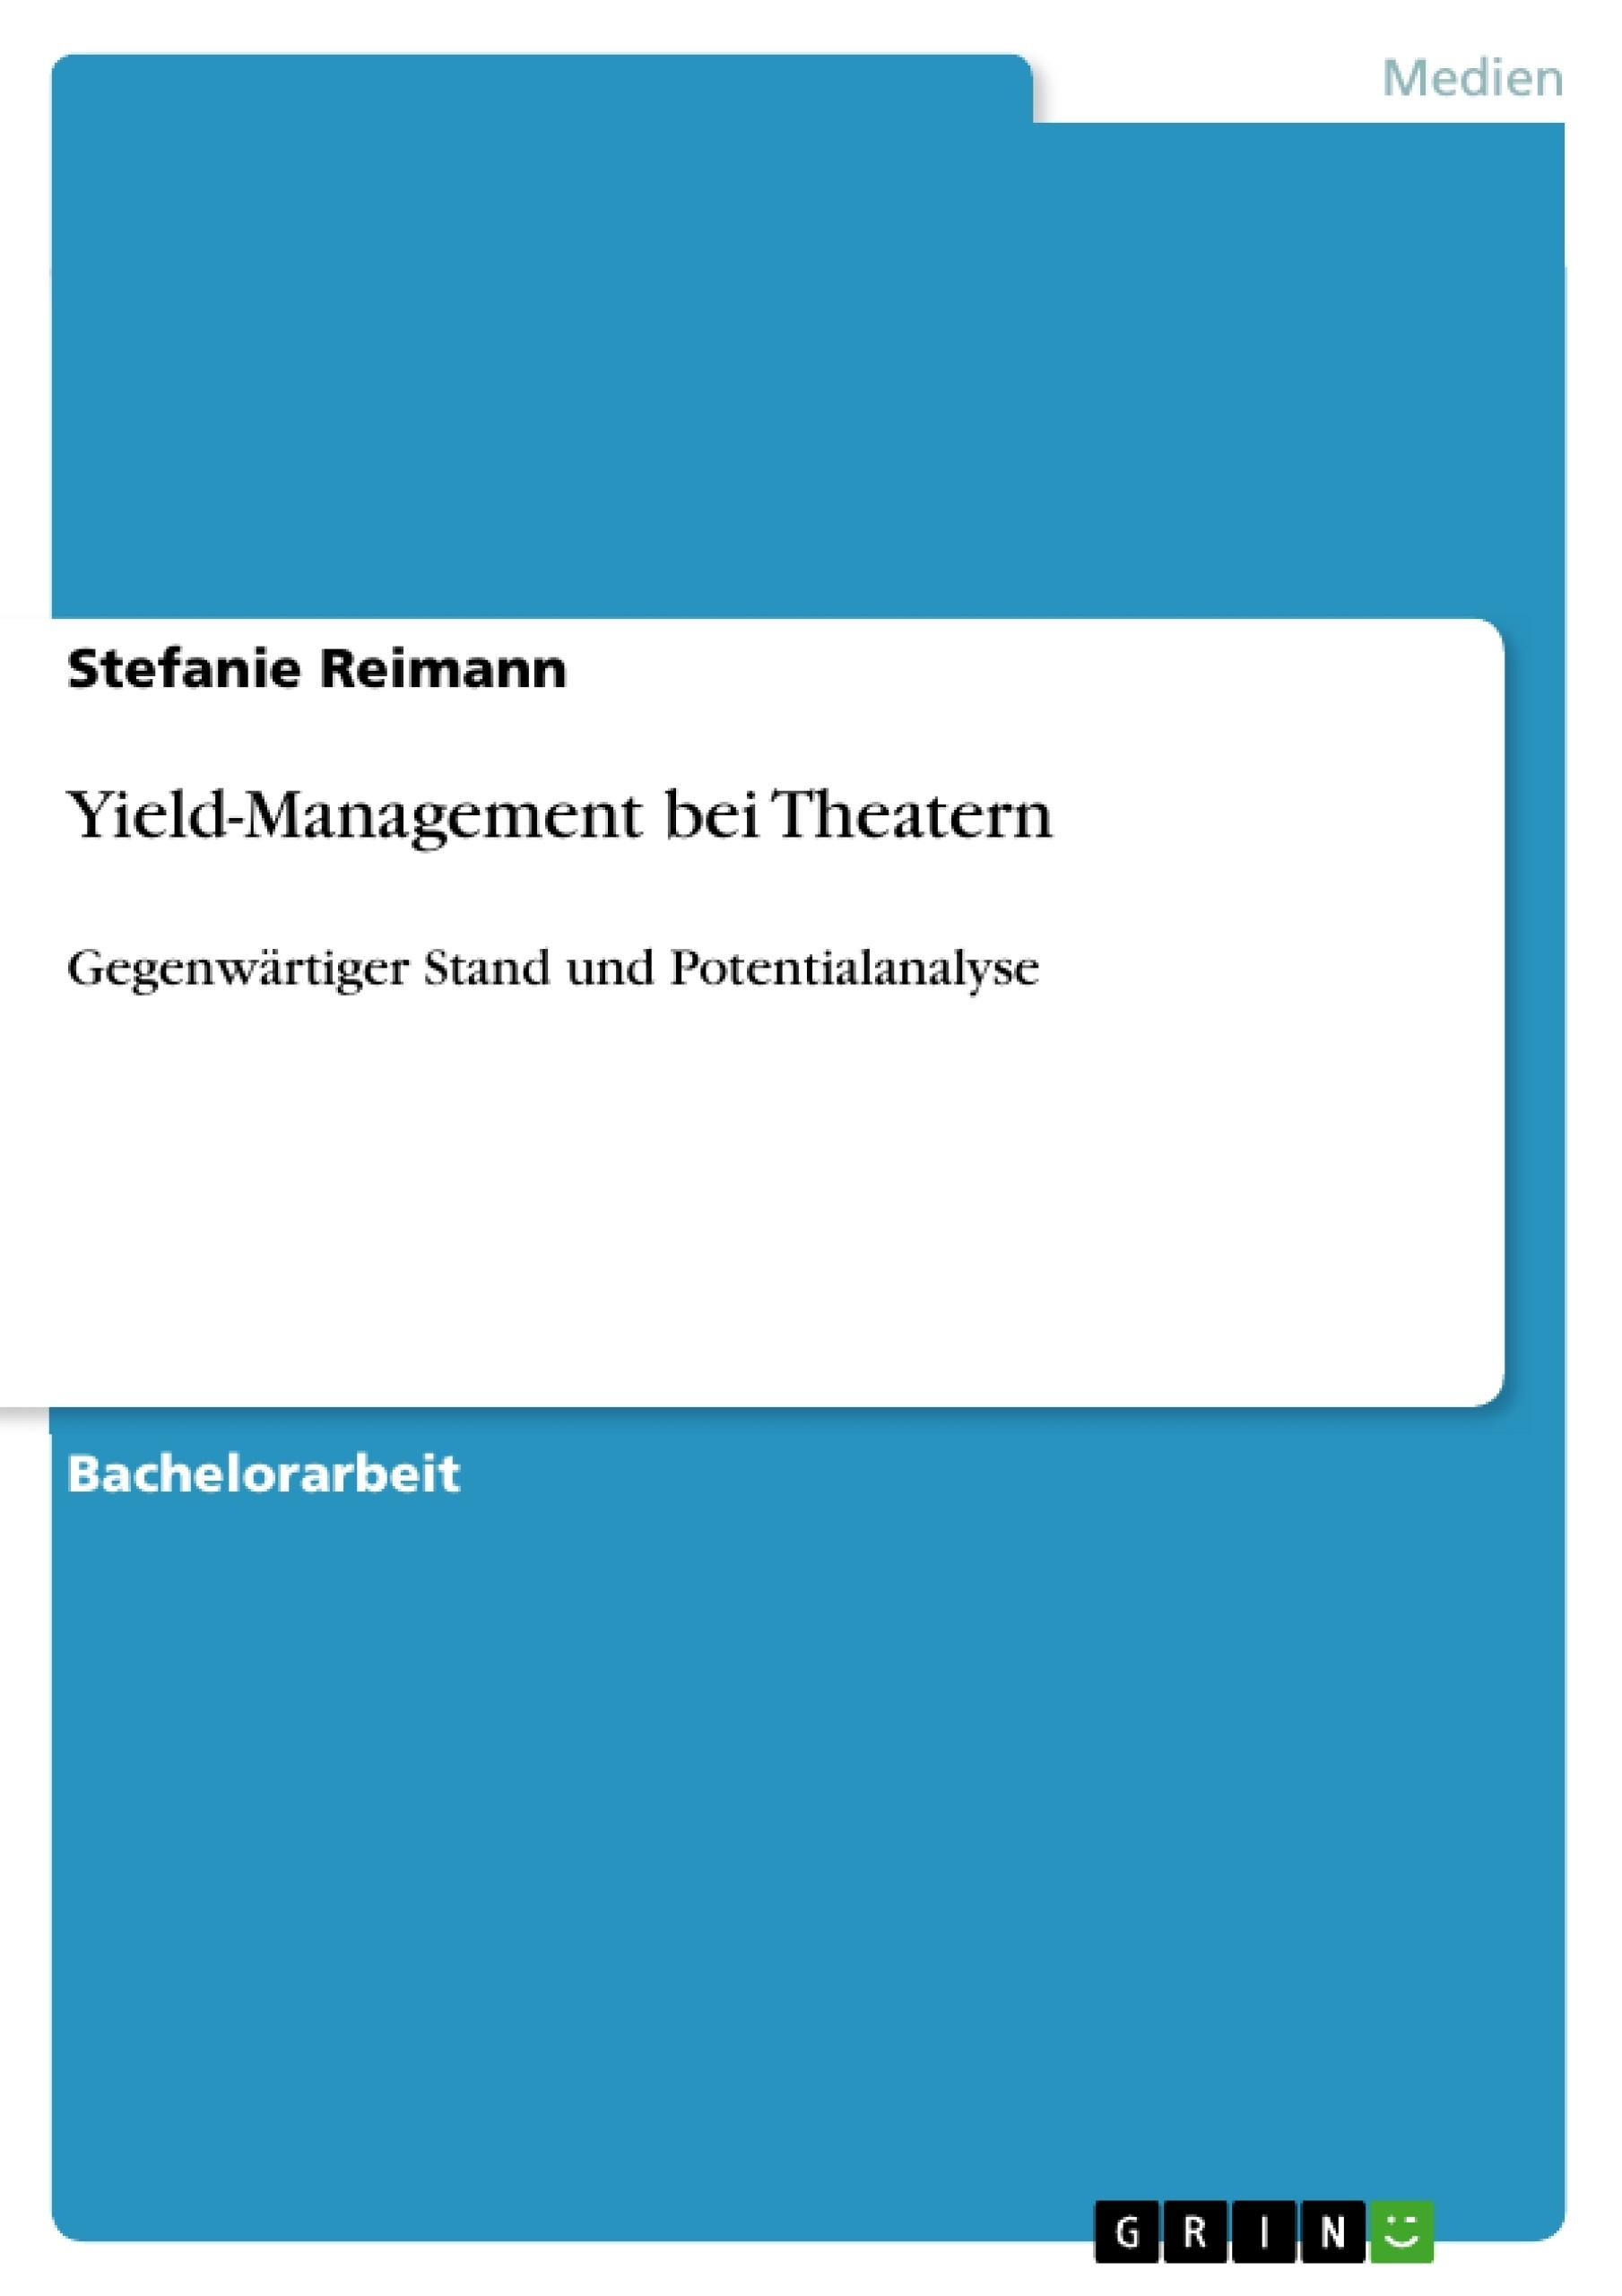 Titel: Yield-Management bei Theatern